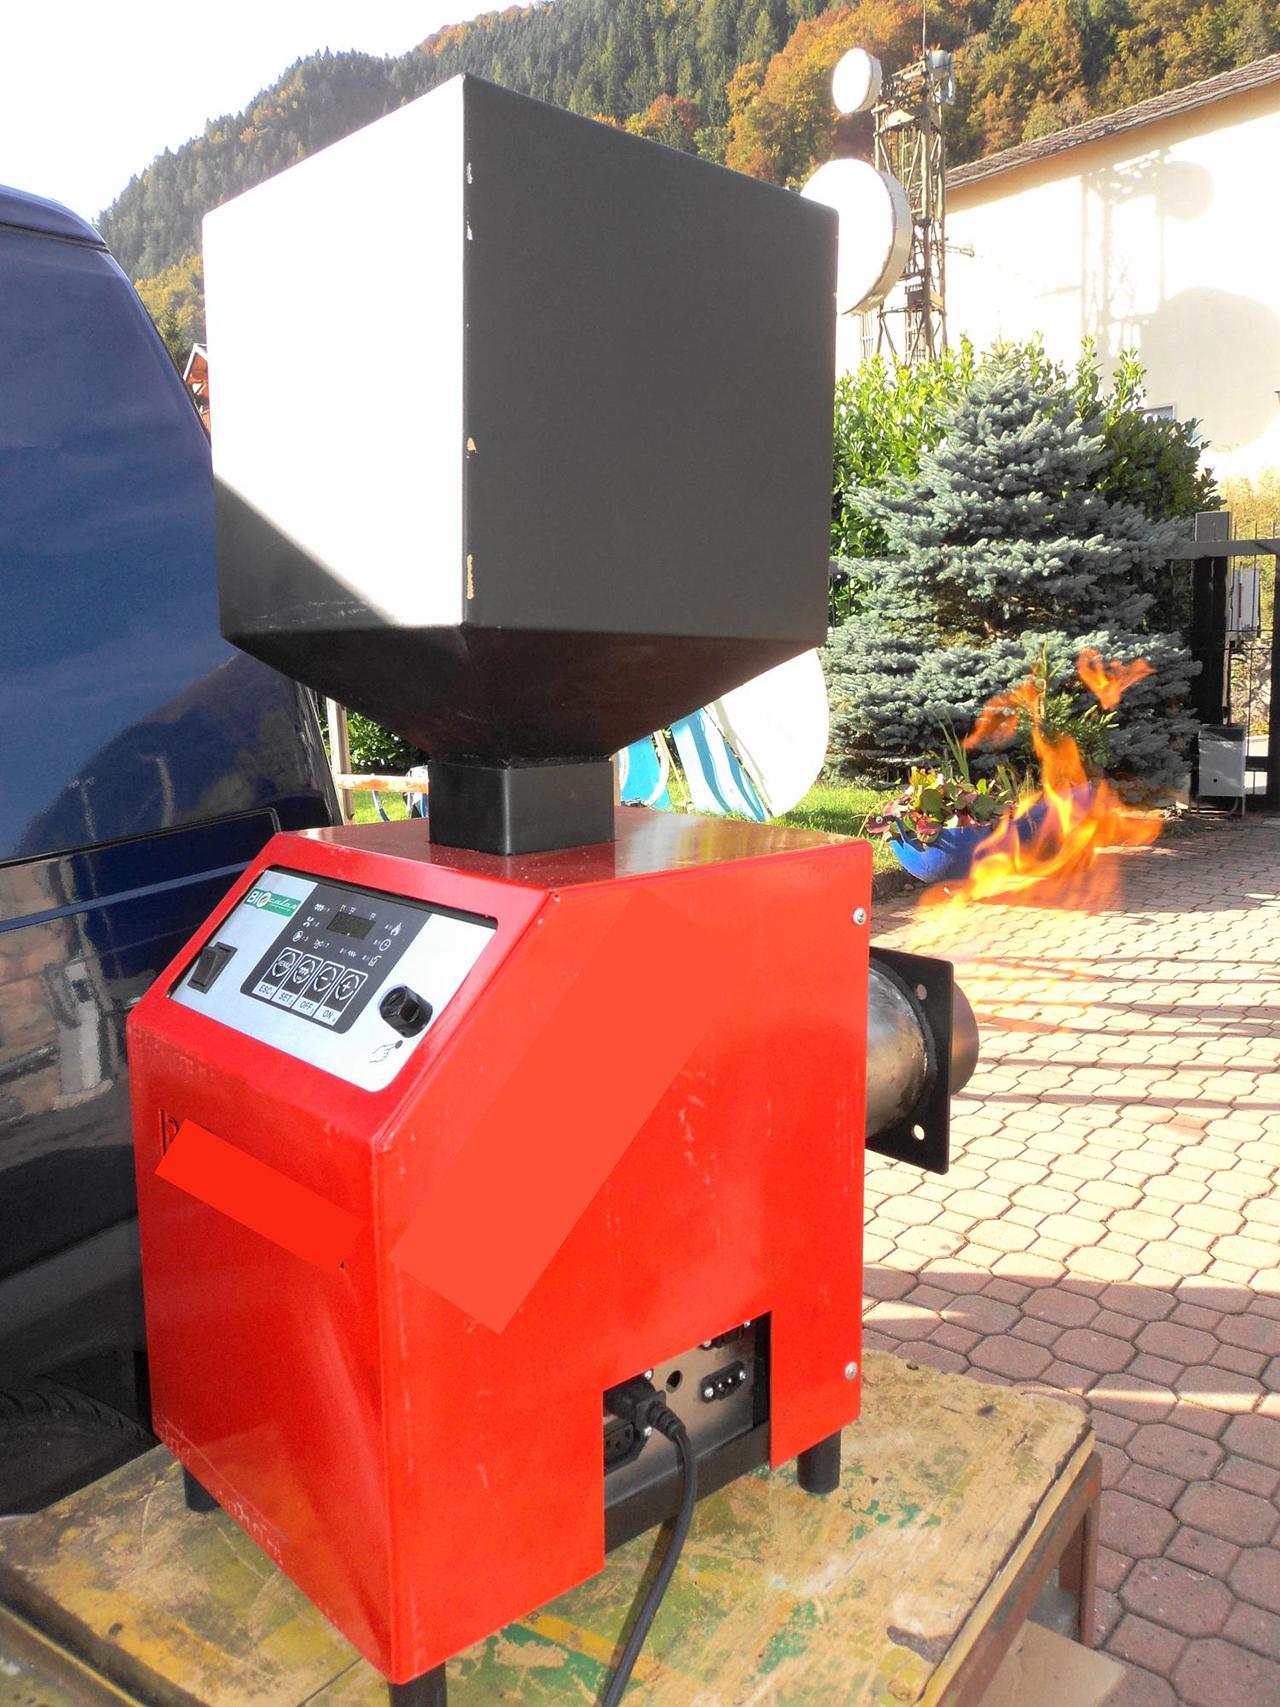 Bruciatore a pellet biocalor viteconica manutenzioni for Bruciatore a sansa usato